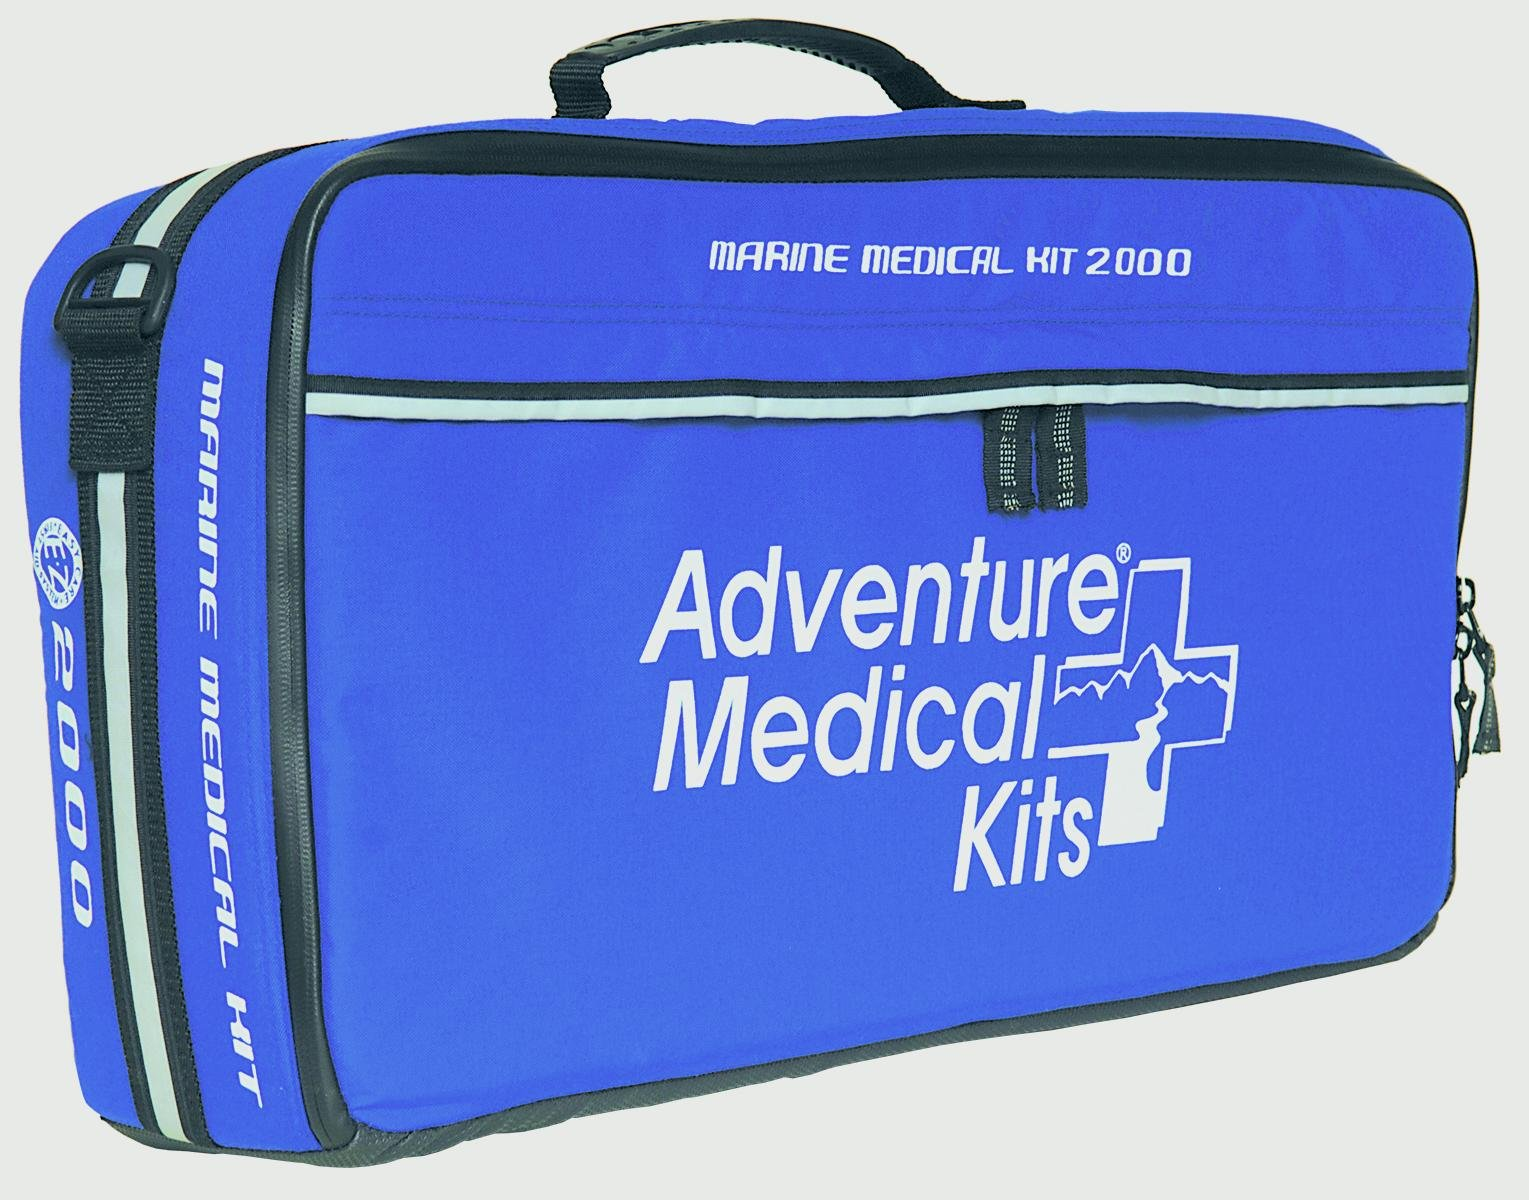 Adventure® Medical Kits Marine 2000, Marine First Aid Kit, Offshore Sailing, Cruising, Fishing, 12 lbs. 4 oz.